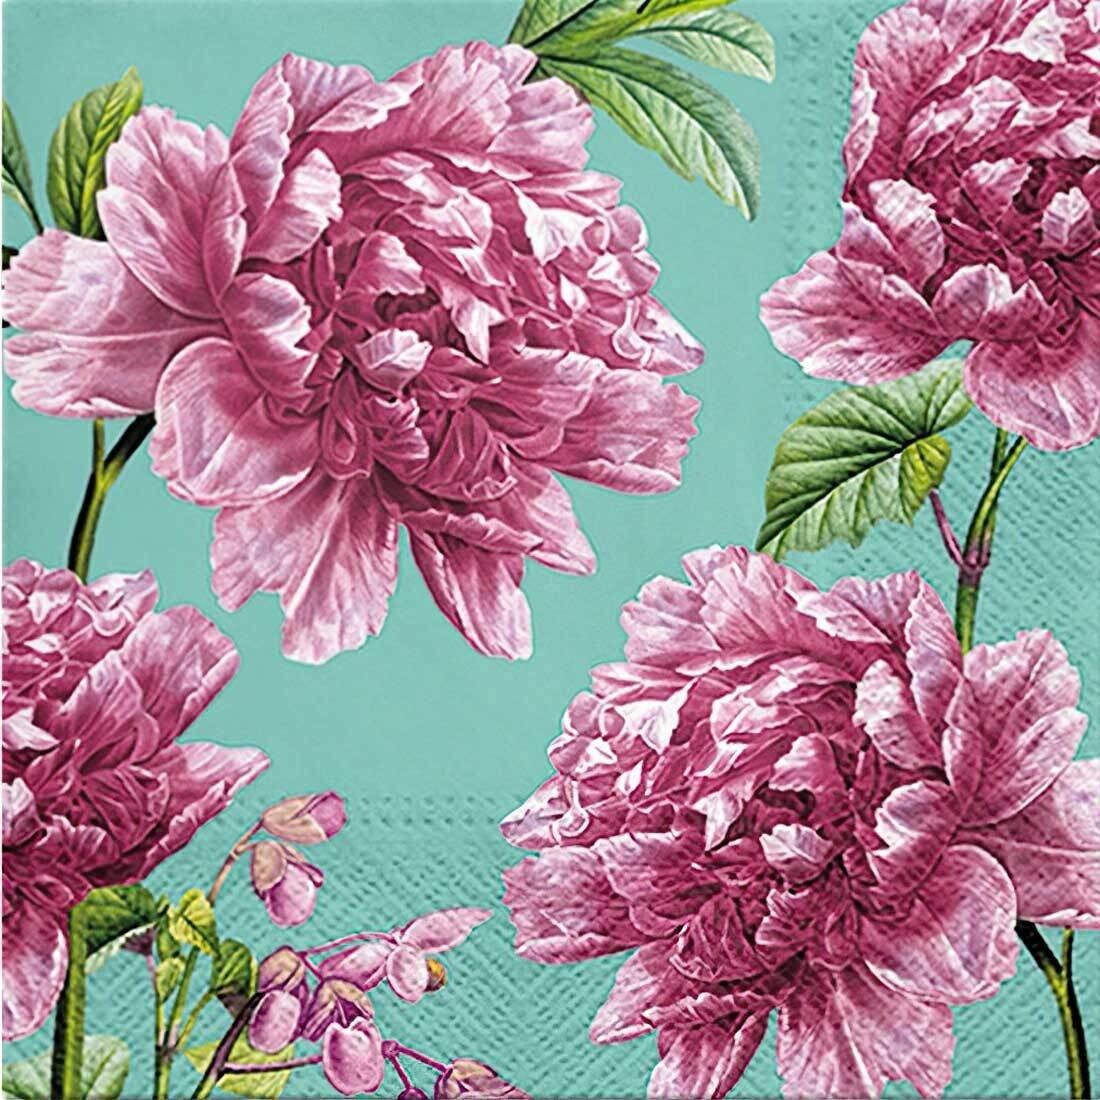 Decoupage Paper Napkins - Floral - Beautiful Peonies (1 Sheet)